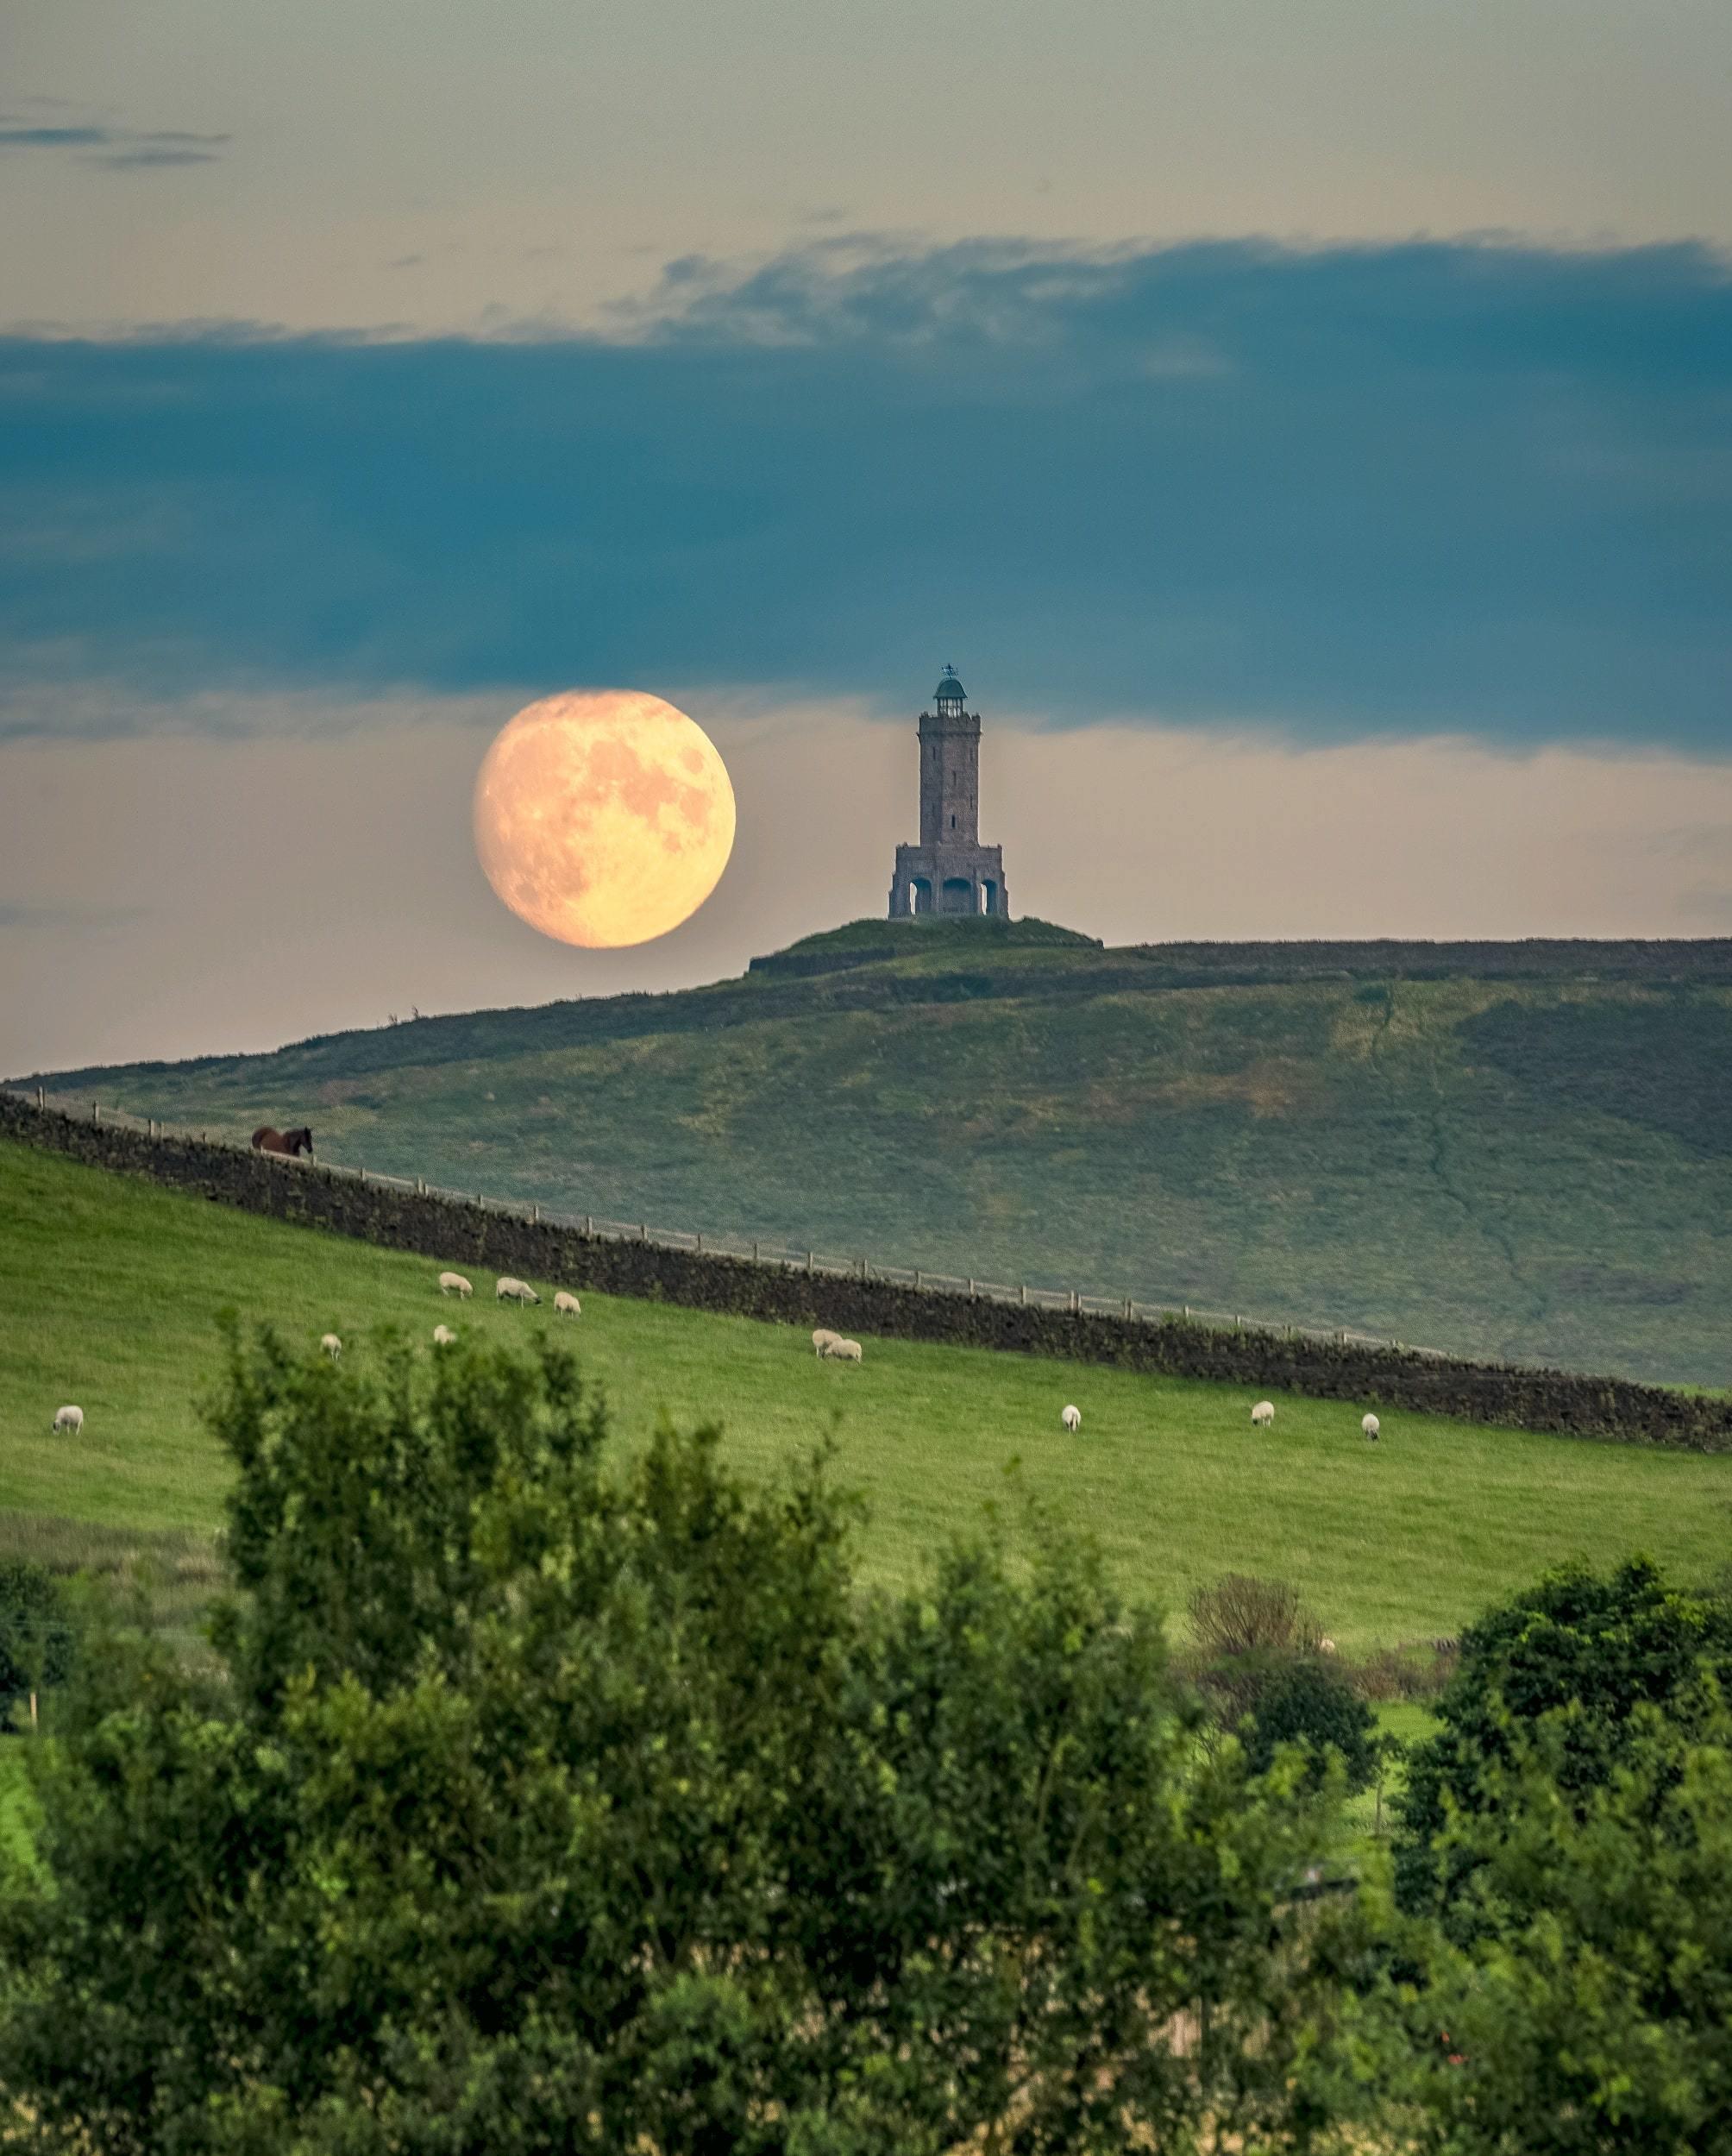 Photographer captures stunning moon image above Darwen Tower